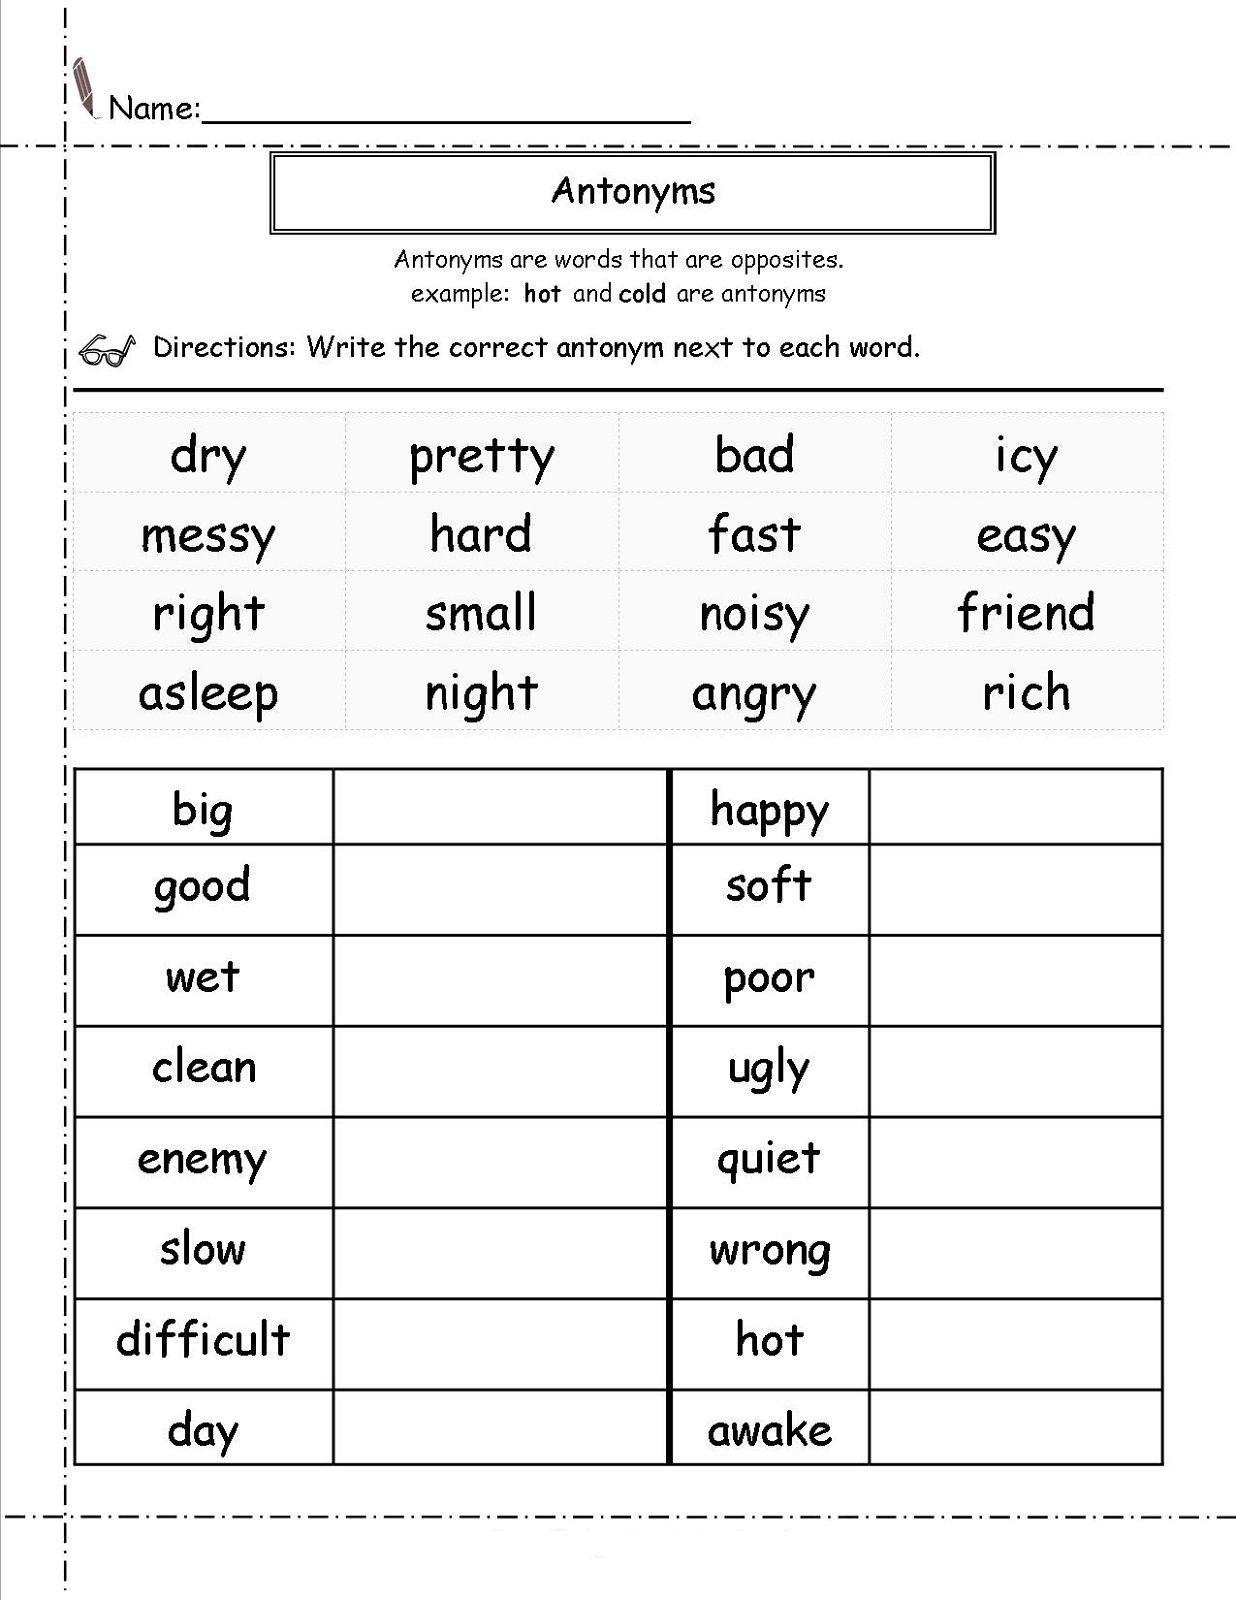 Second Grade Worksheets English Antonyms Learning Printable In 2020 2nd Grade Math Worksheets 2nd Grade Reading Worksheets 2nd Grade Worksheets